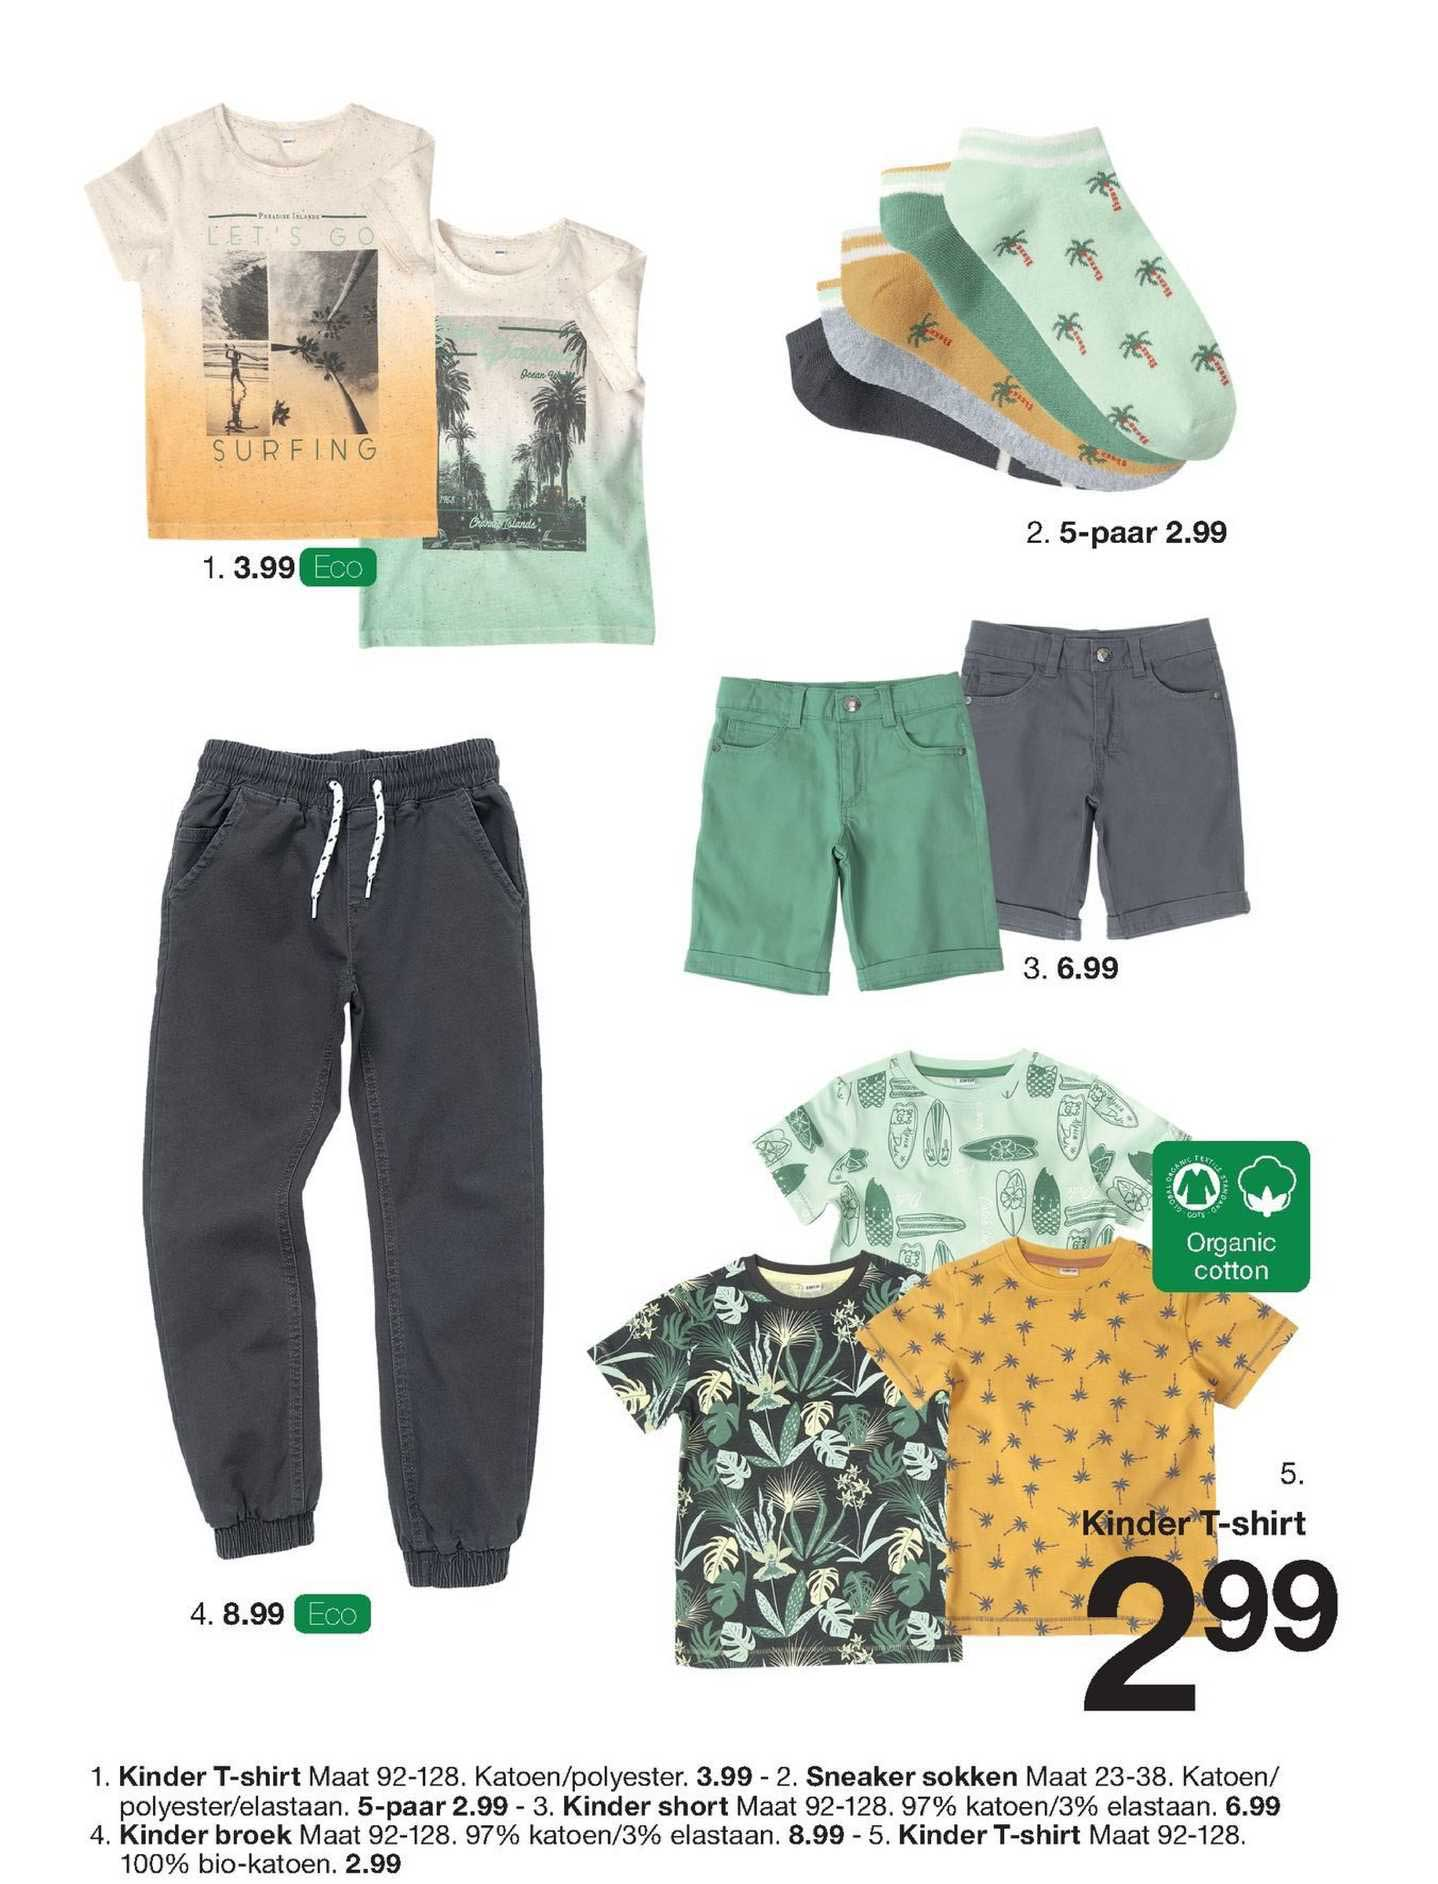 Zeeman Kinder T-Shirt, Sneaker Sokken, Kinder Short Of Kinder Broek